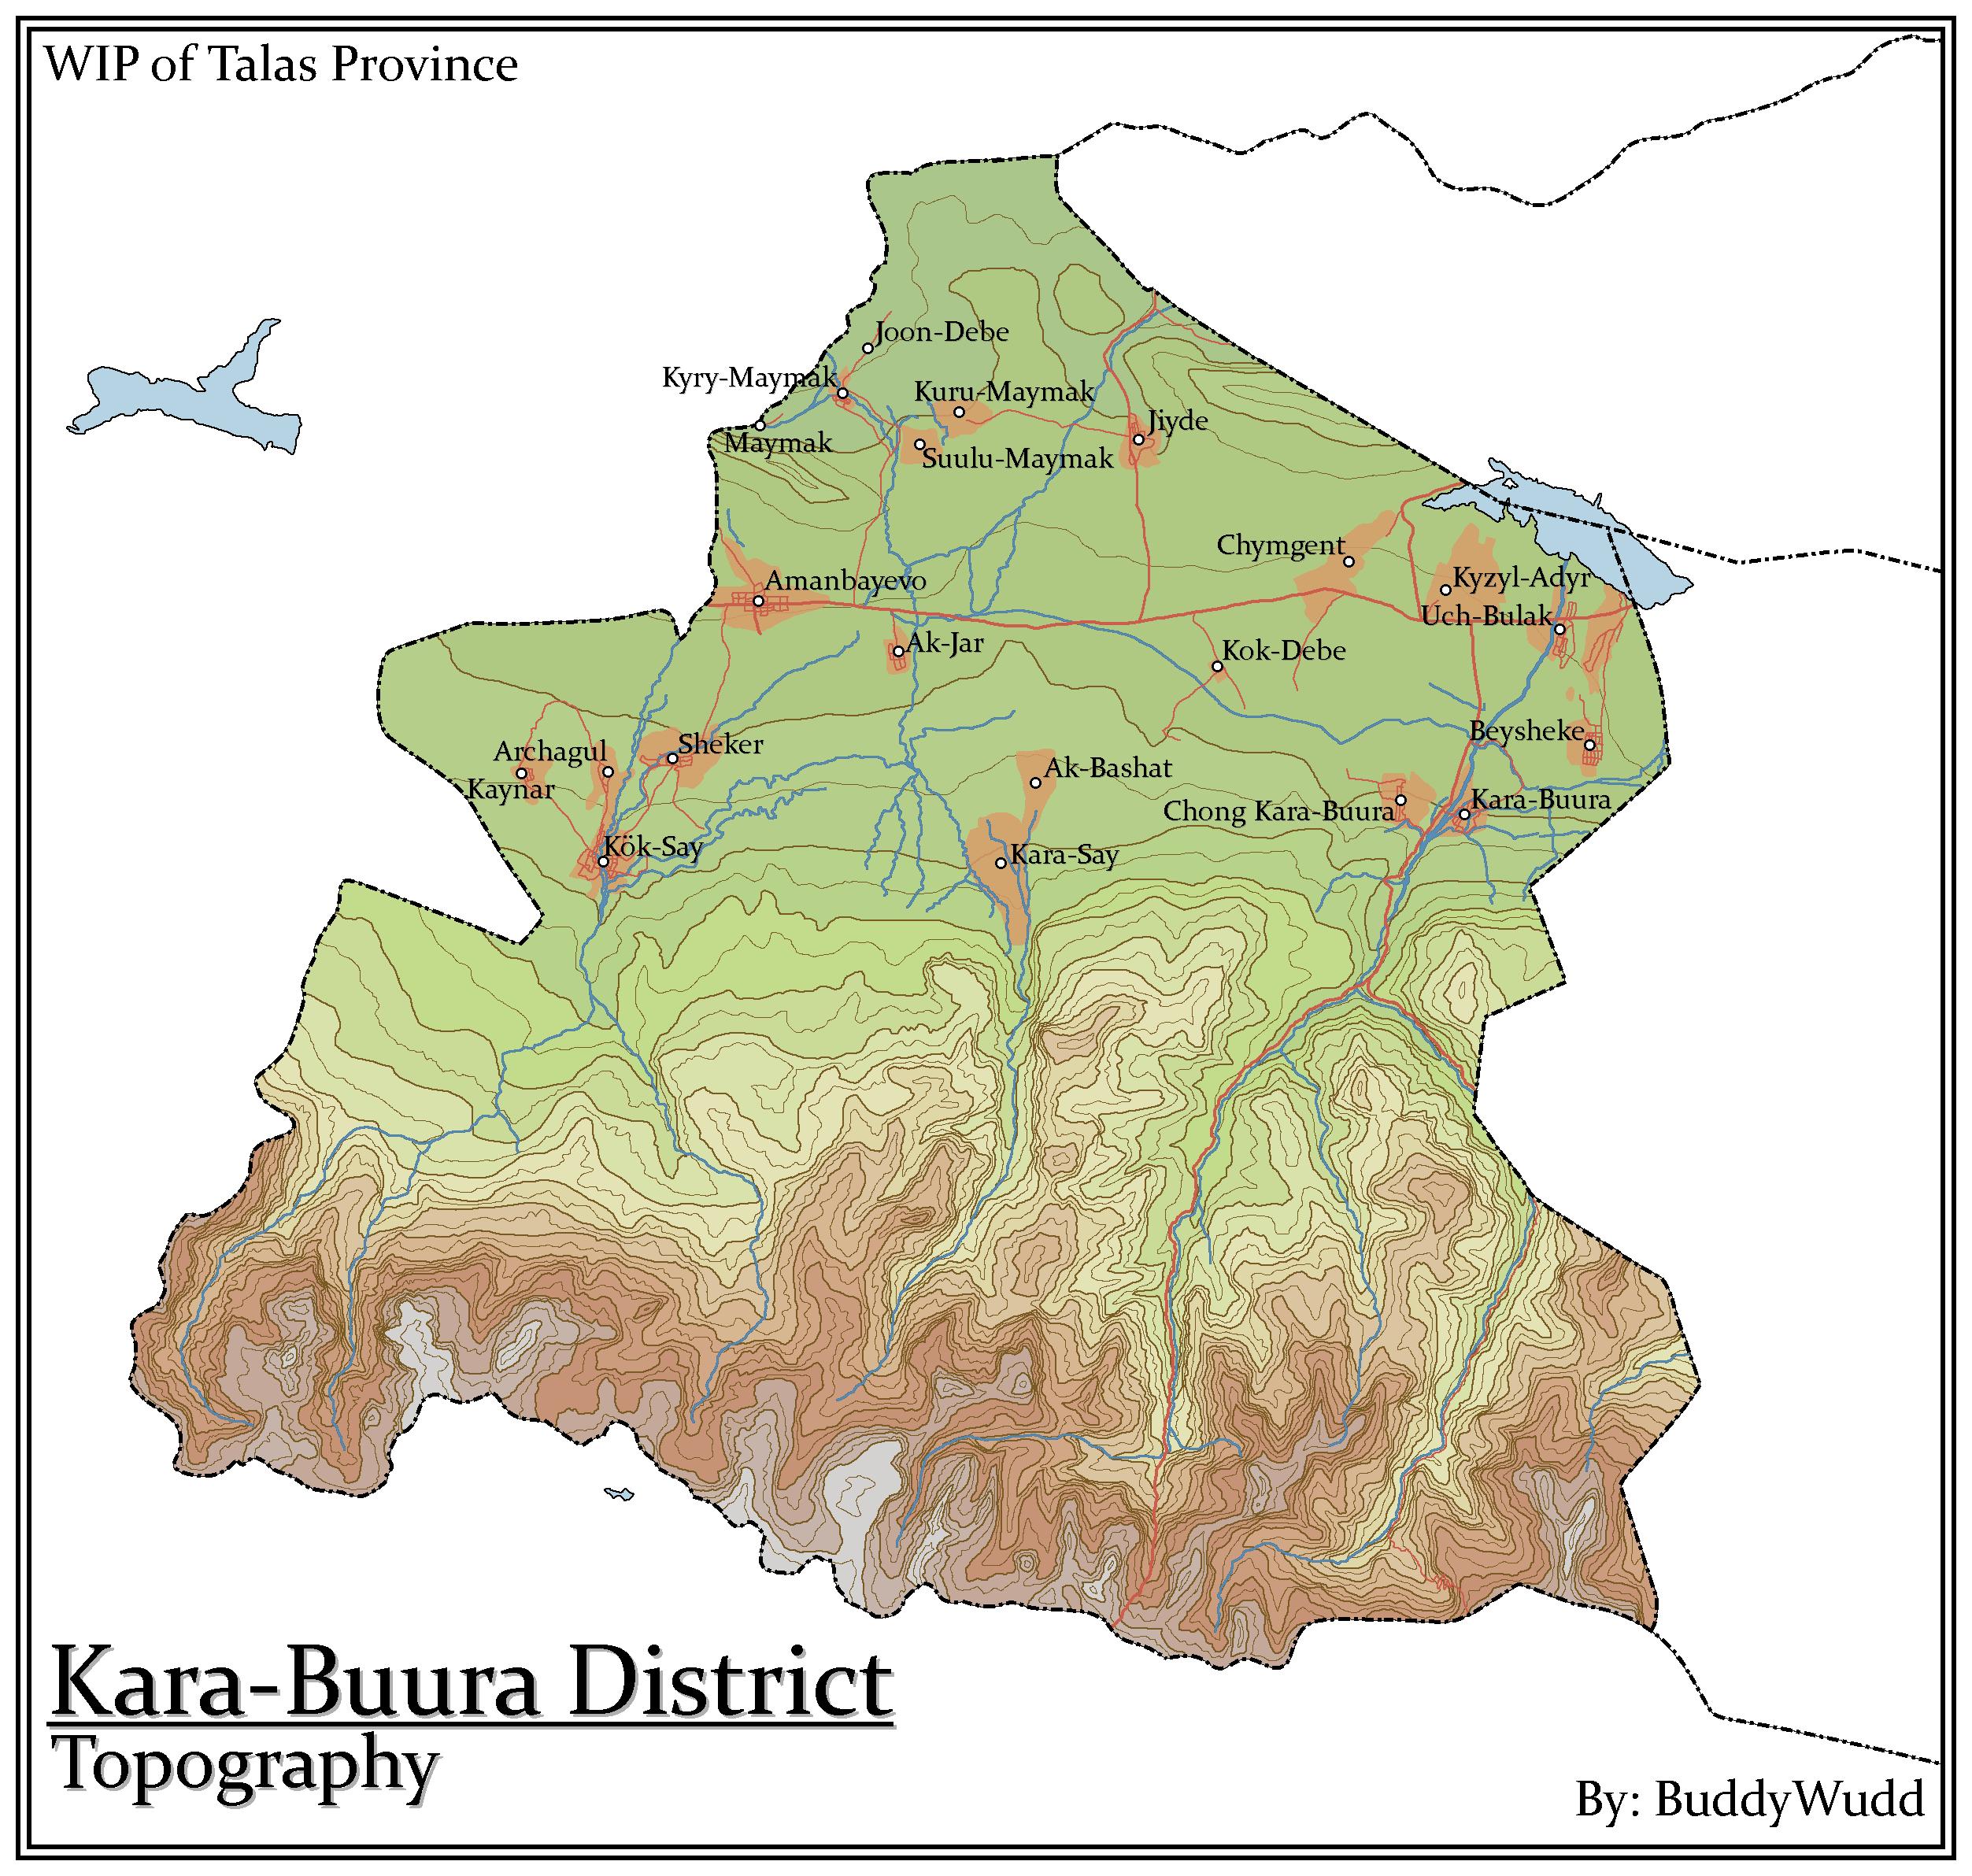 Kara-Buura Topographic Map - Talas, Kyrgyzstan by BuddyWudd ...